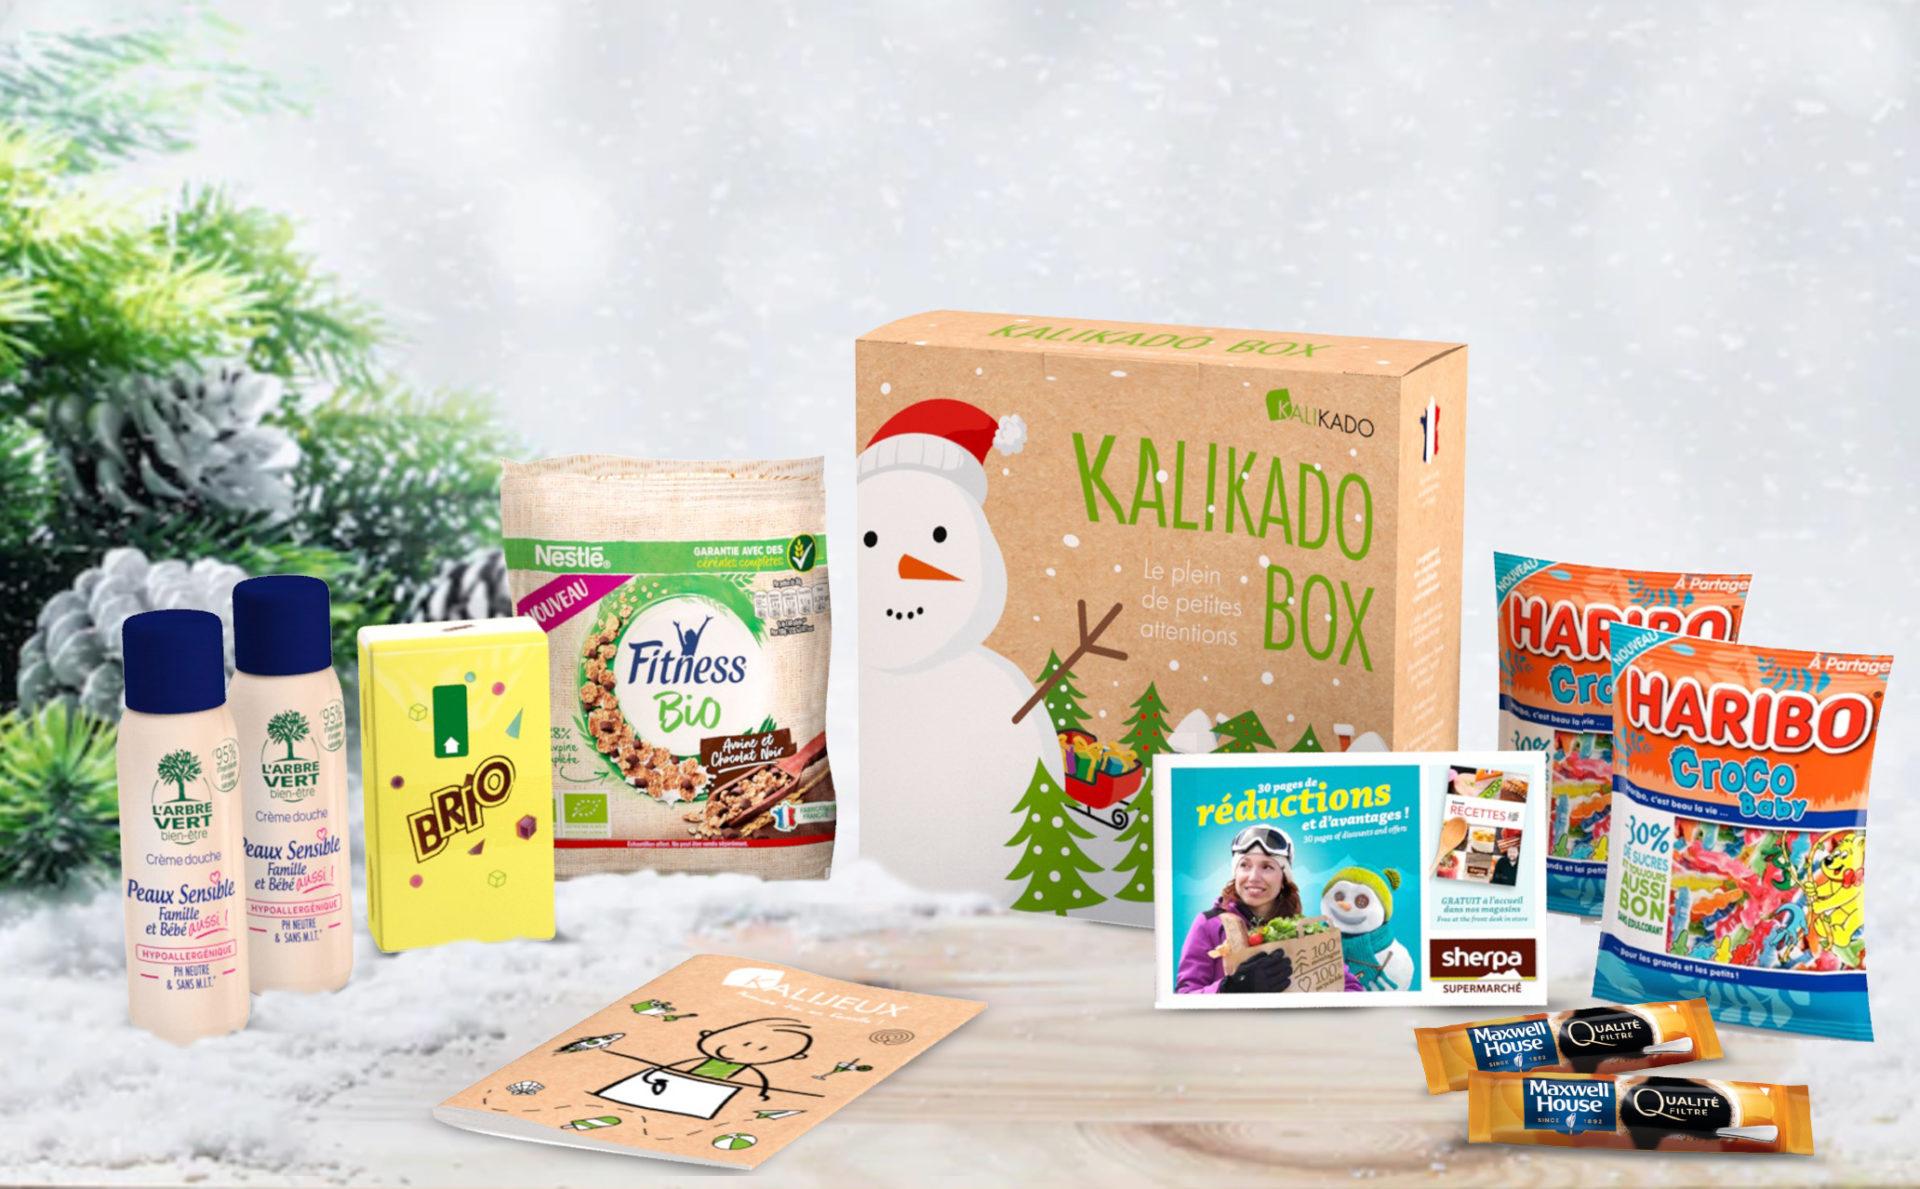 KaliKado Box Vacances